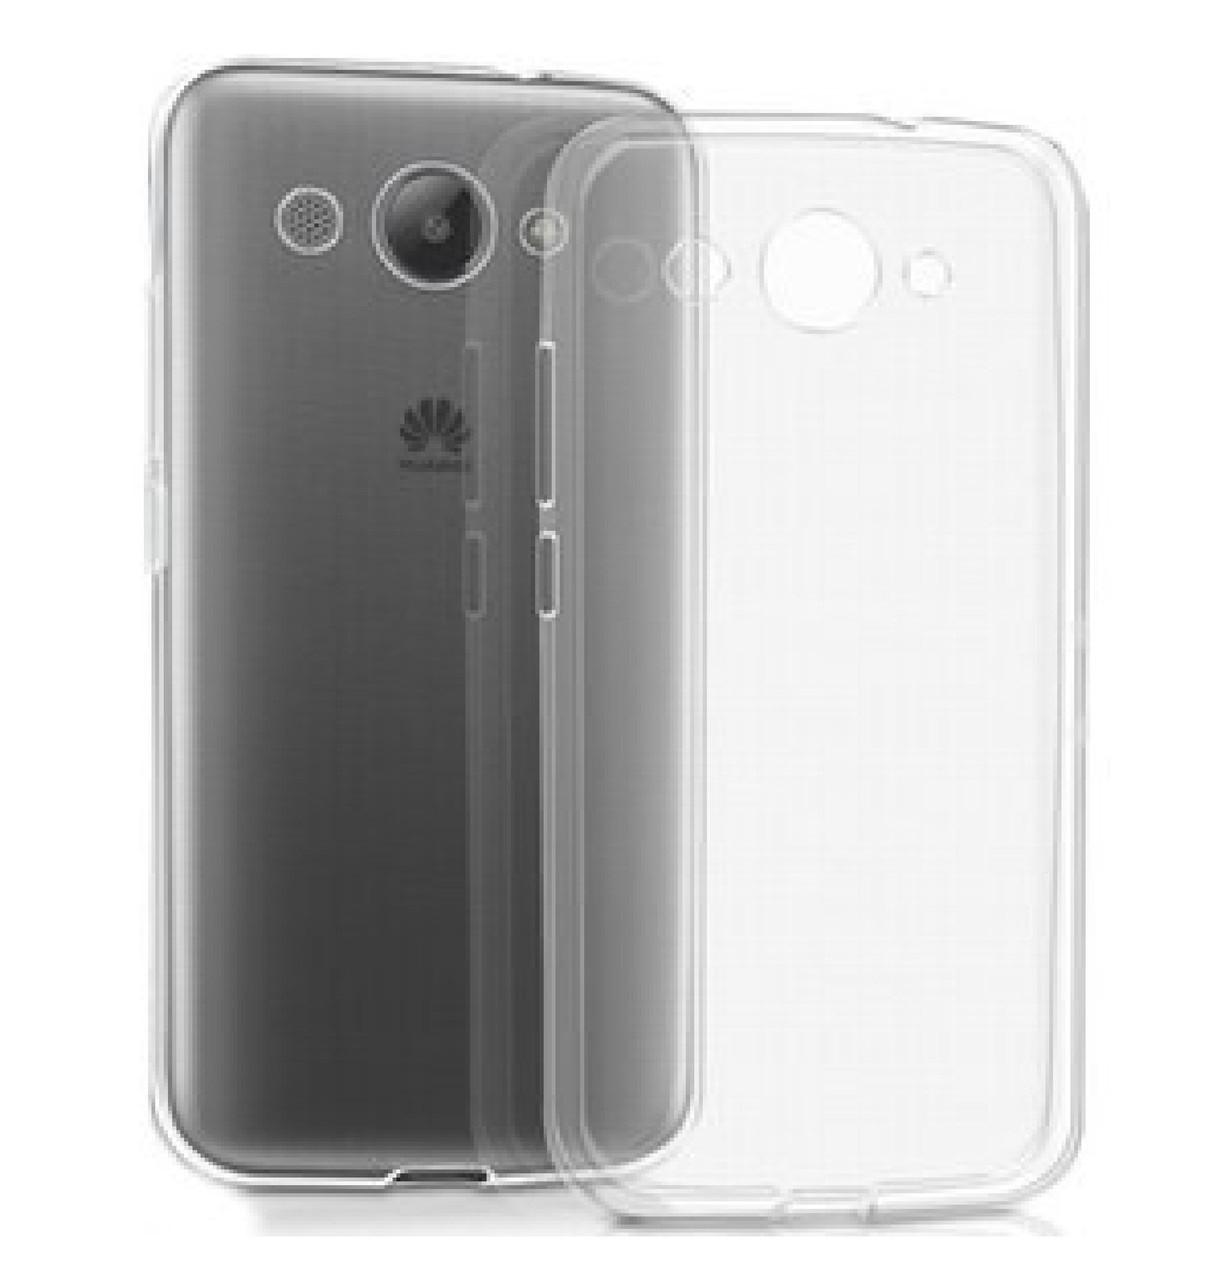 Силиконовая накладка Ultra-thin на Huawei Y3 (2017) Clean Grid Transparent